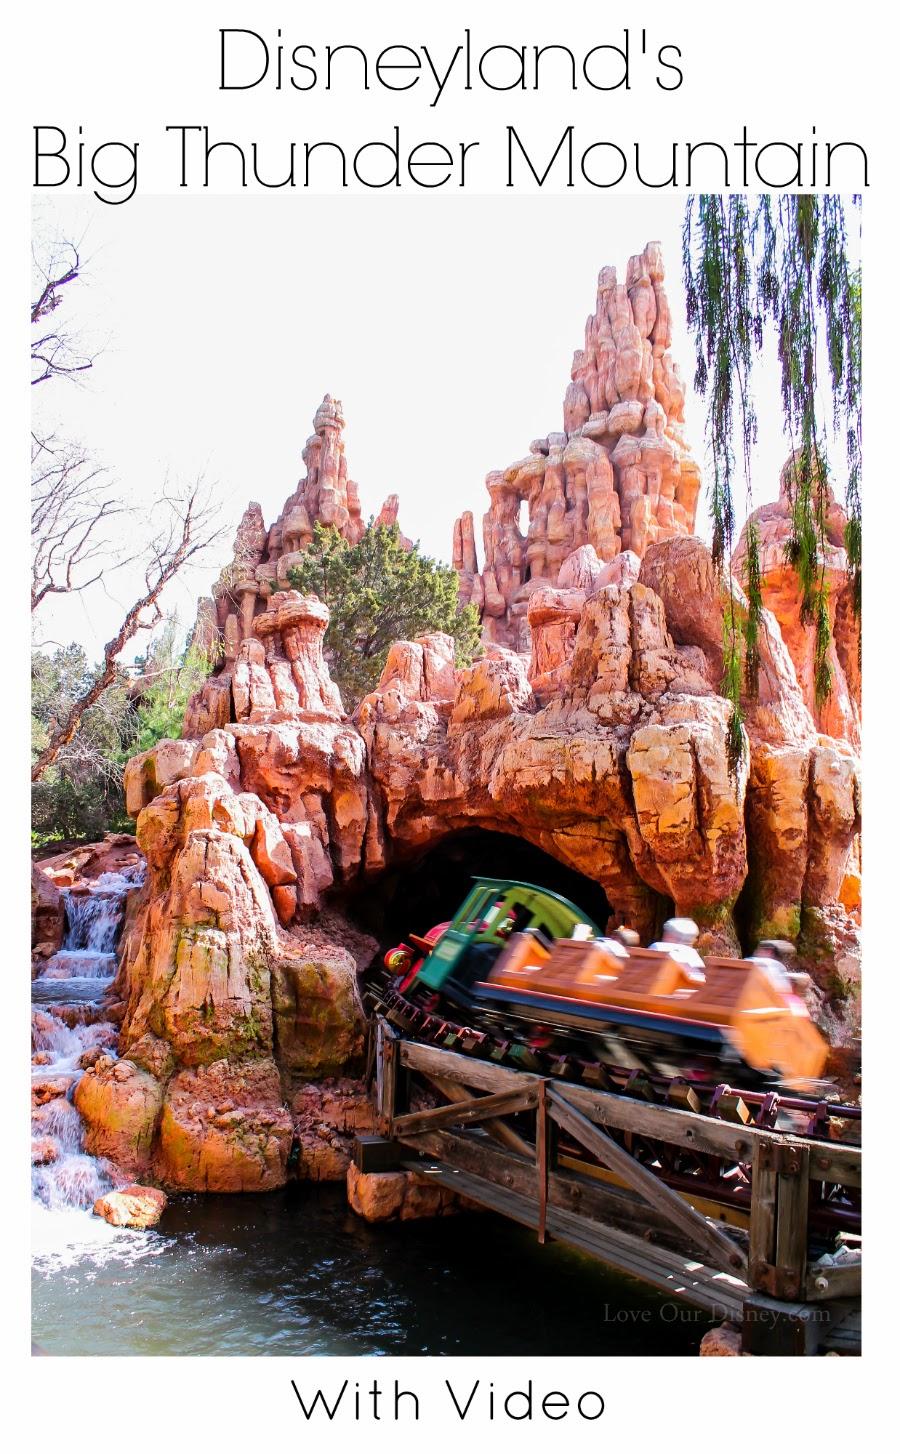 Disneyland Big Thunder Mountain Now Open